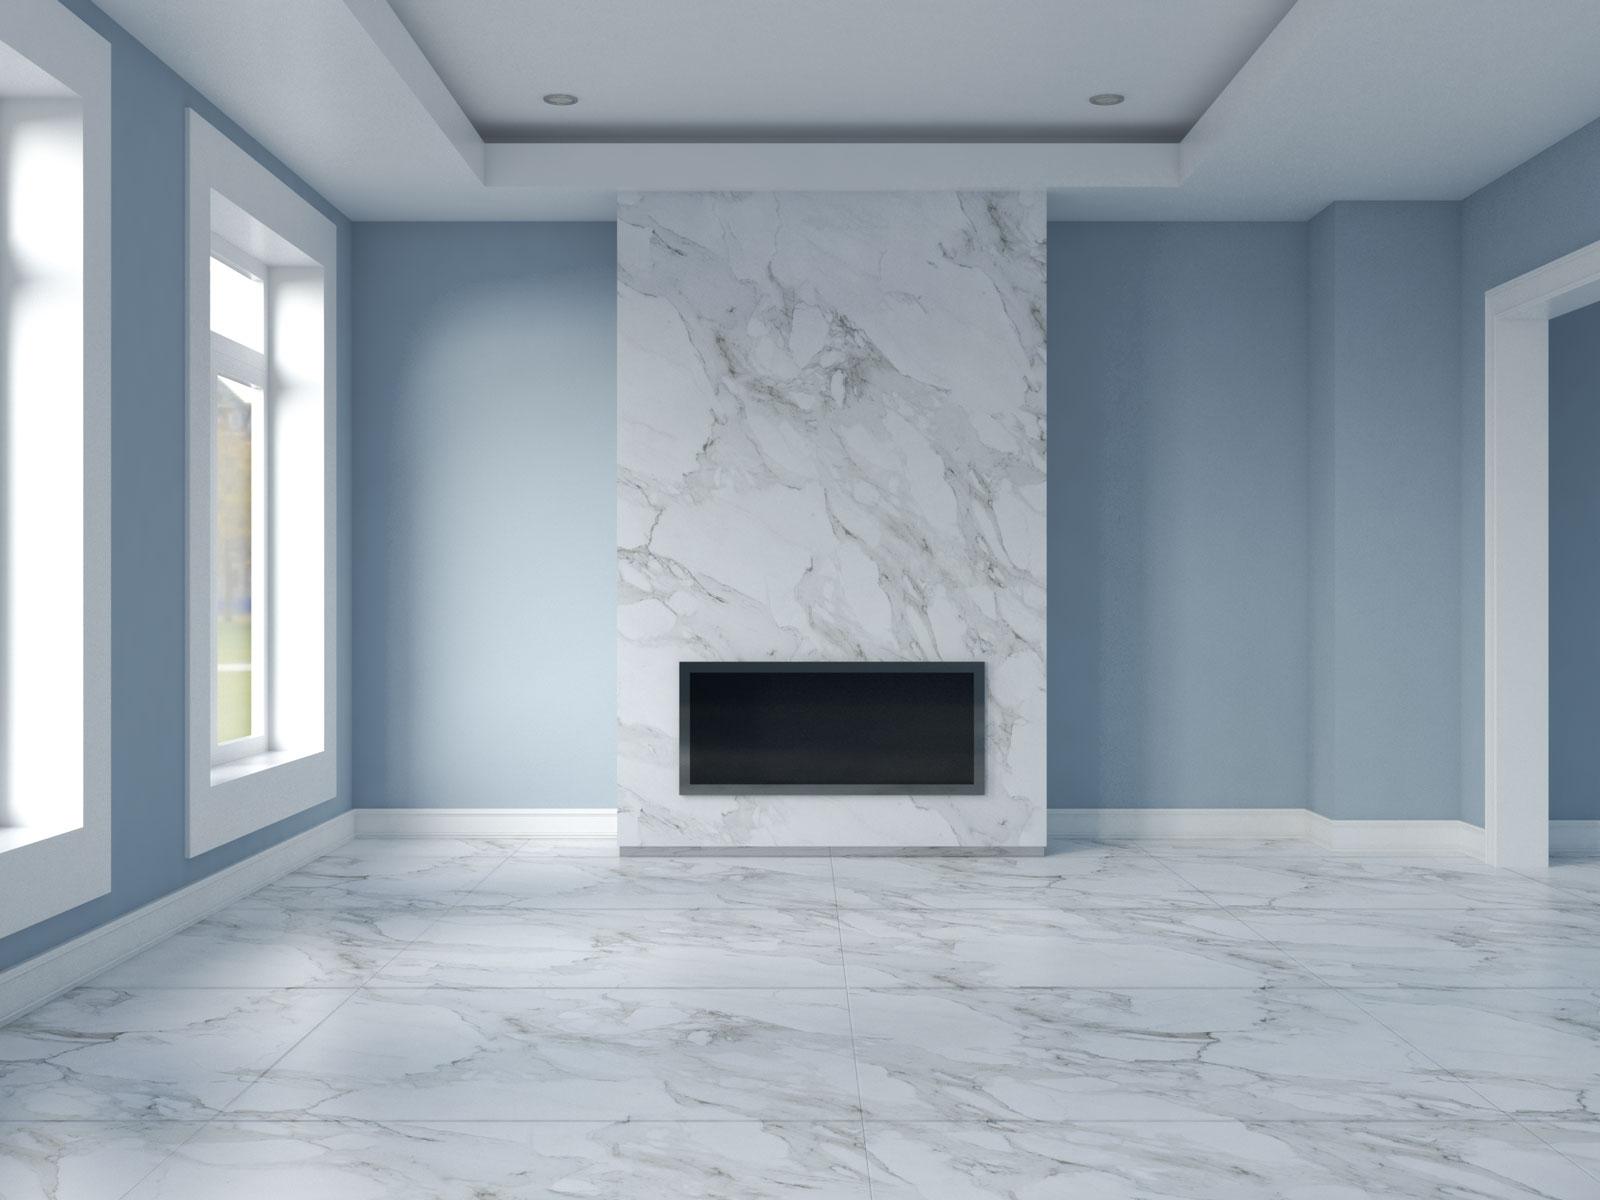 Aleutian walls with white carrara marble